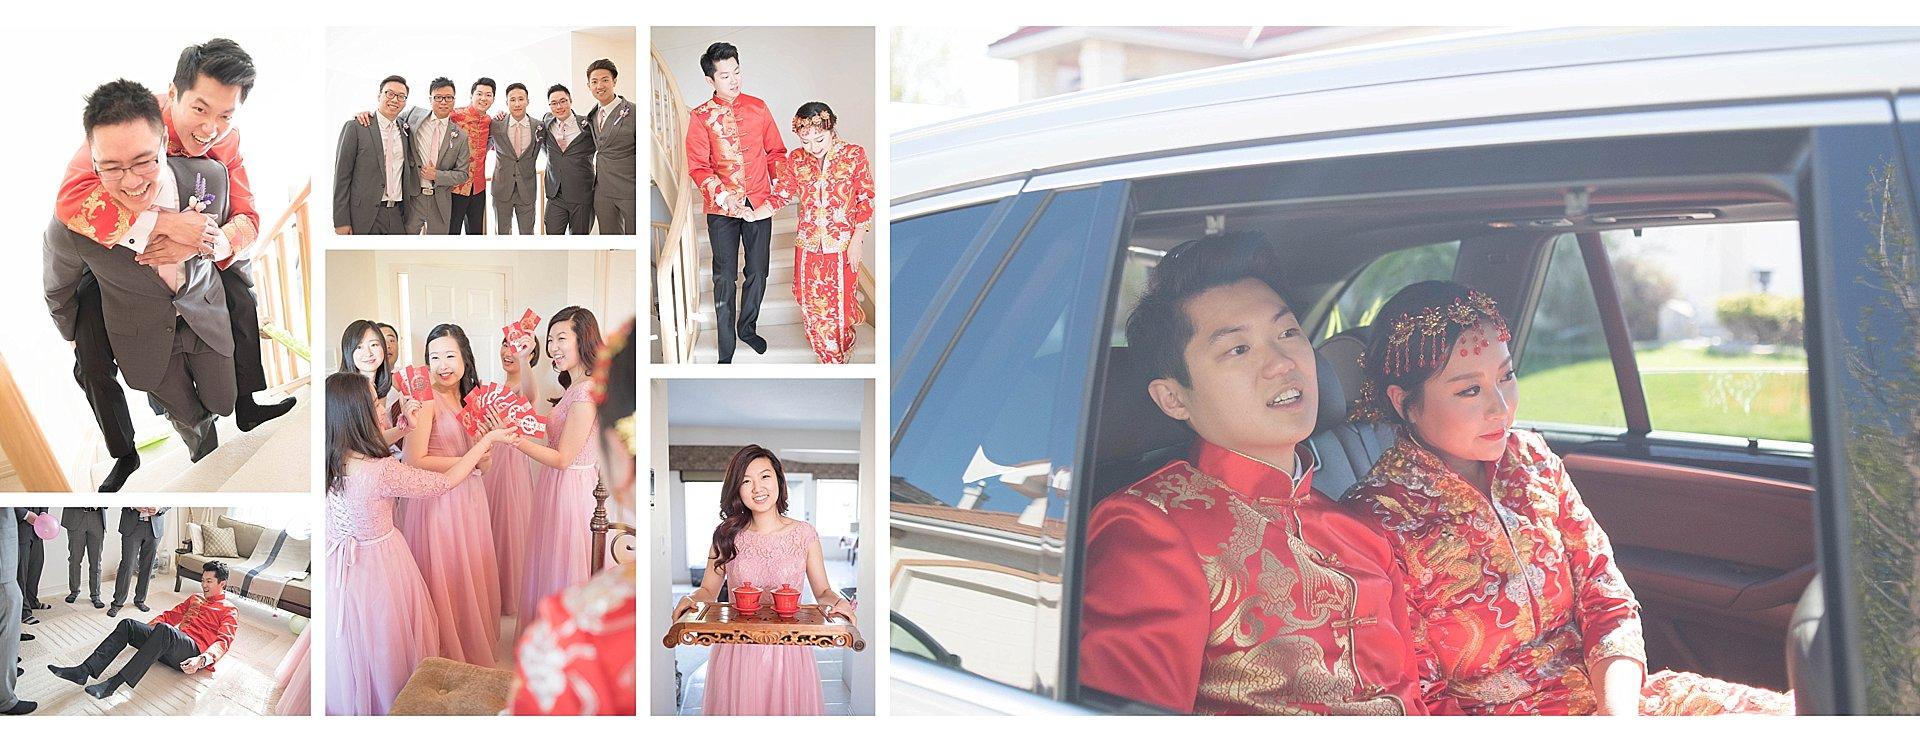 MB-First-Baptist-Church-Edmonton-Wedding-_0002